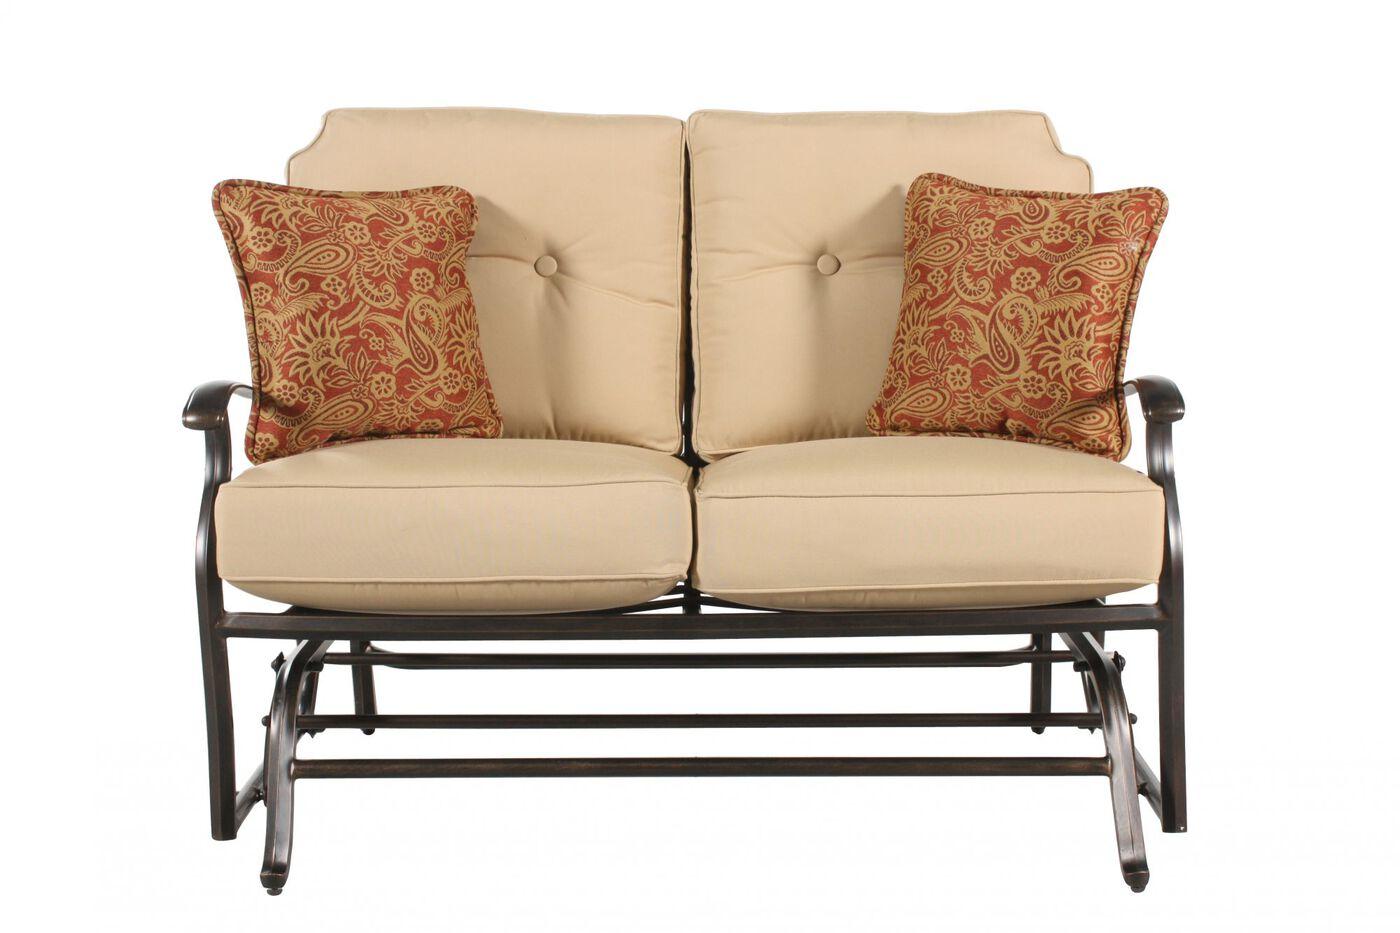 Mathis Brothers Patio Furniture agio heritage select gliding loveseat | mathis brothers furniture